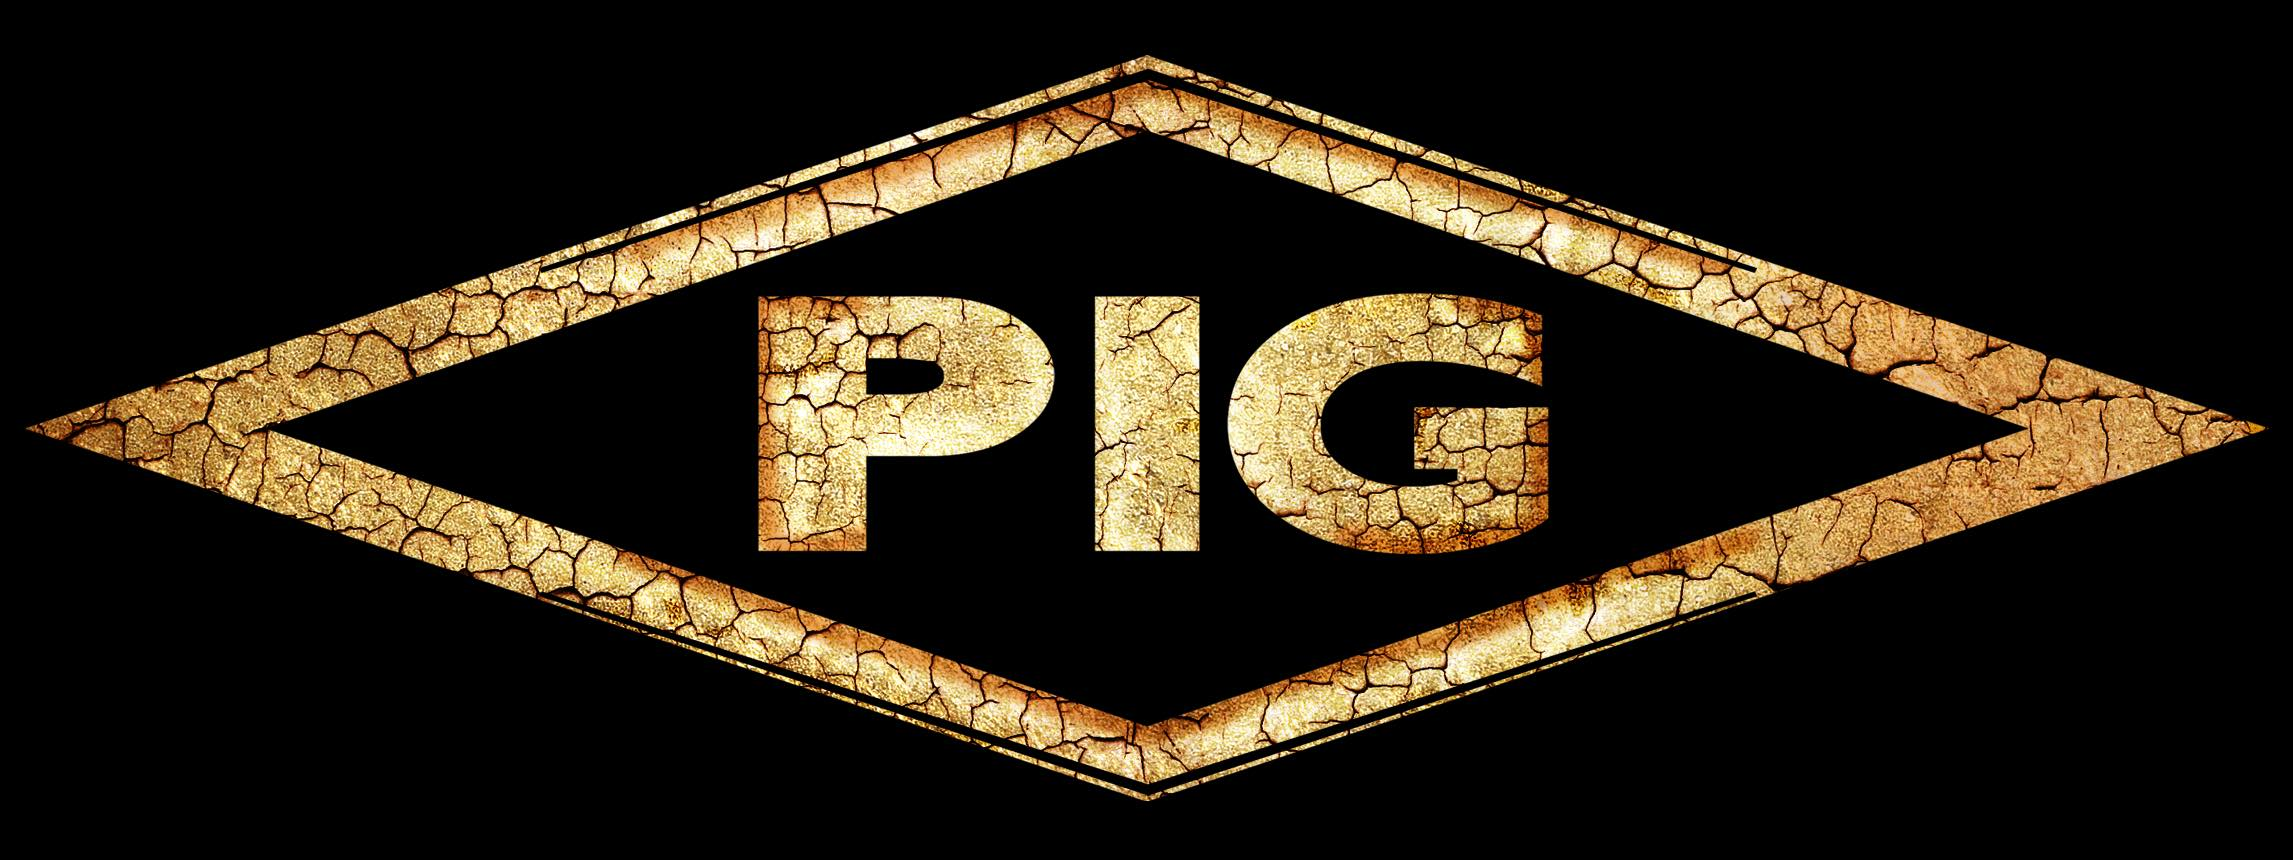 Pig Petes Rock News And Views